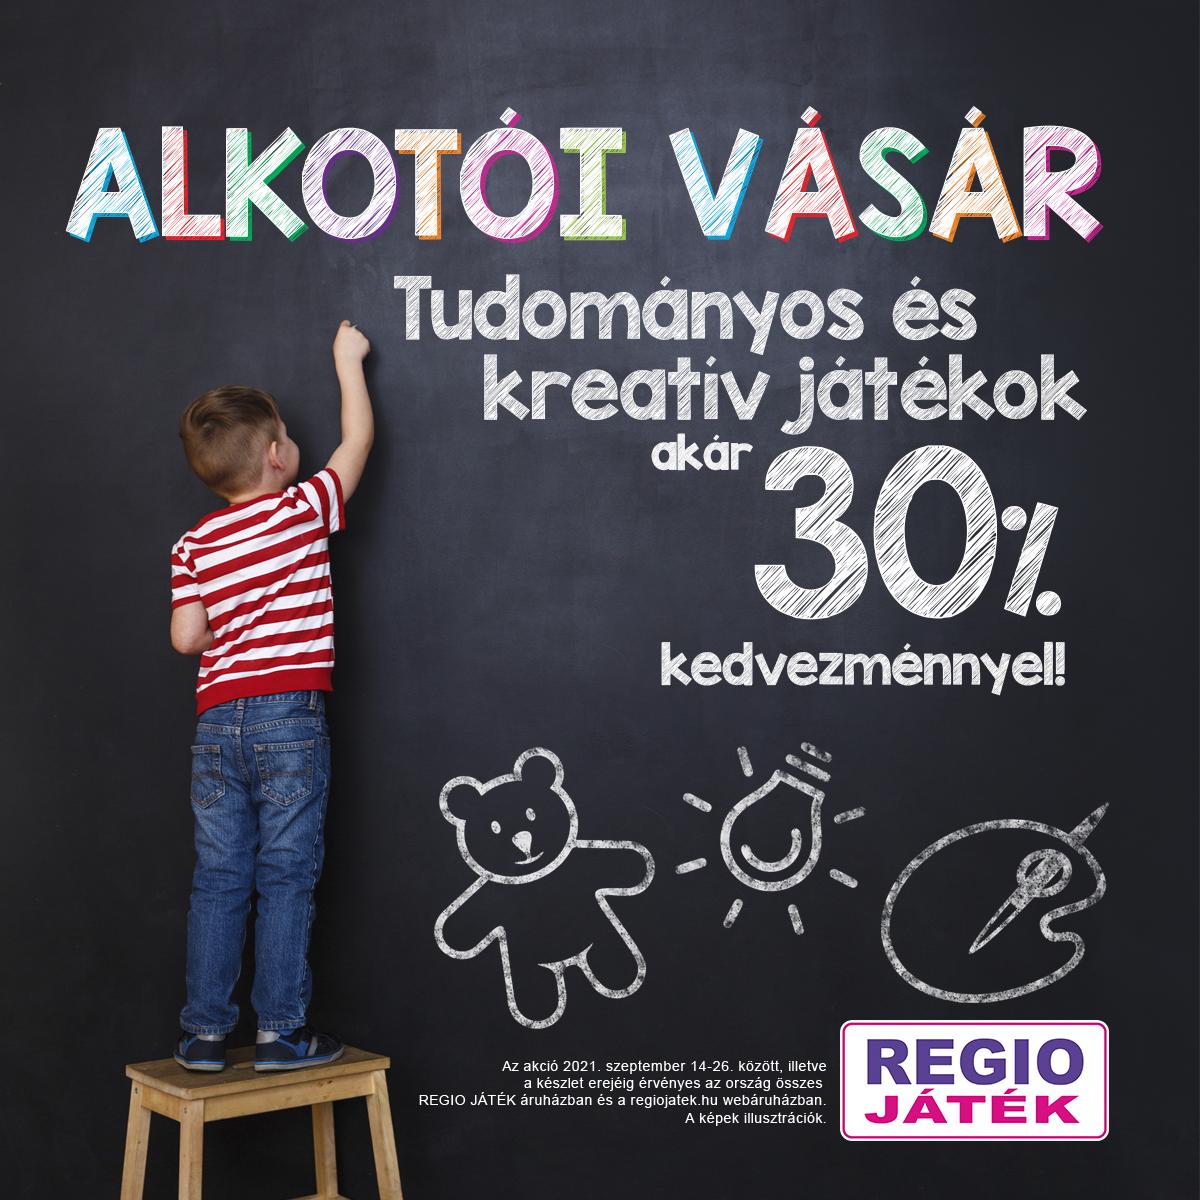 regiojatek_alkotovasar_1200x1200